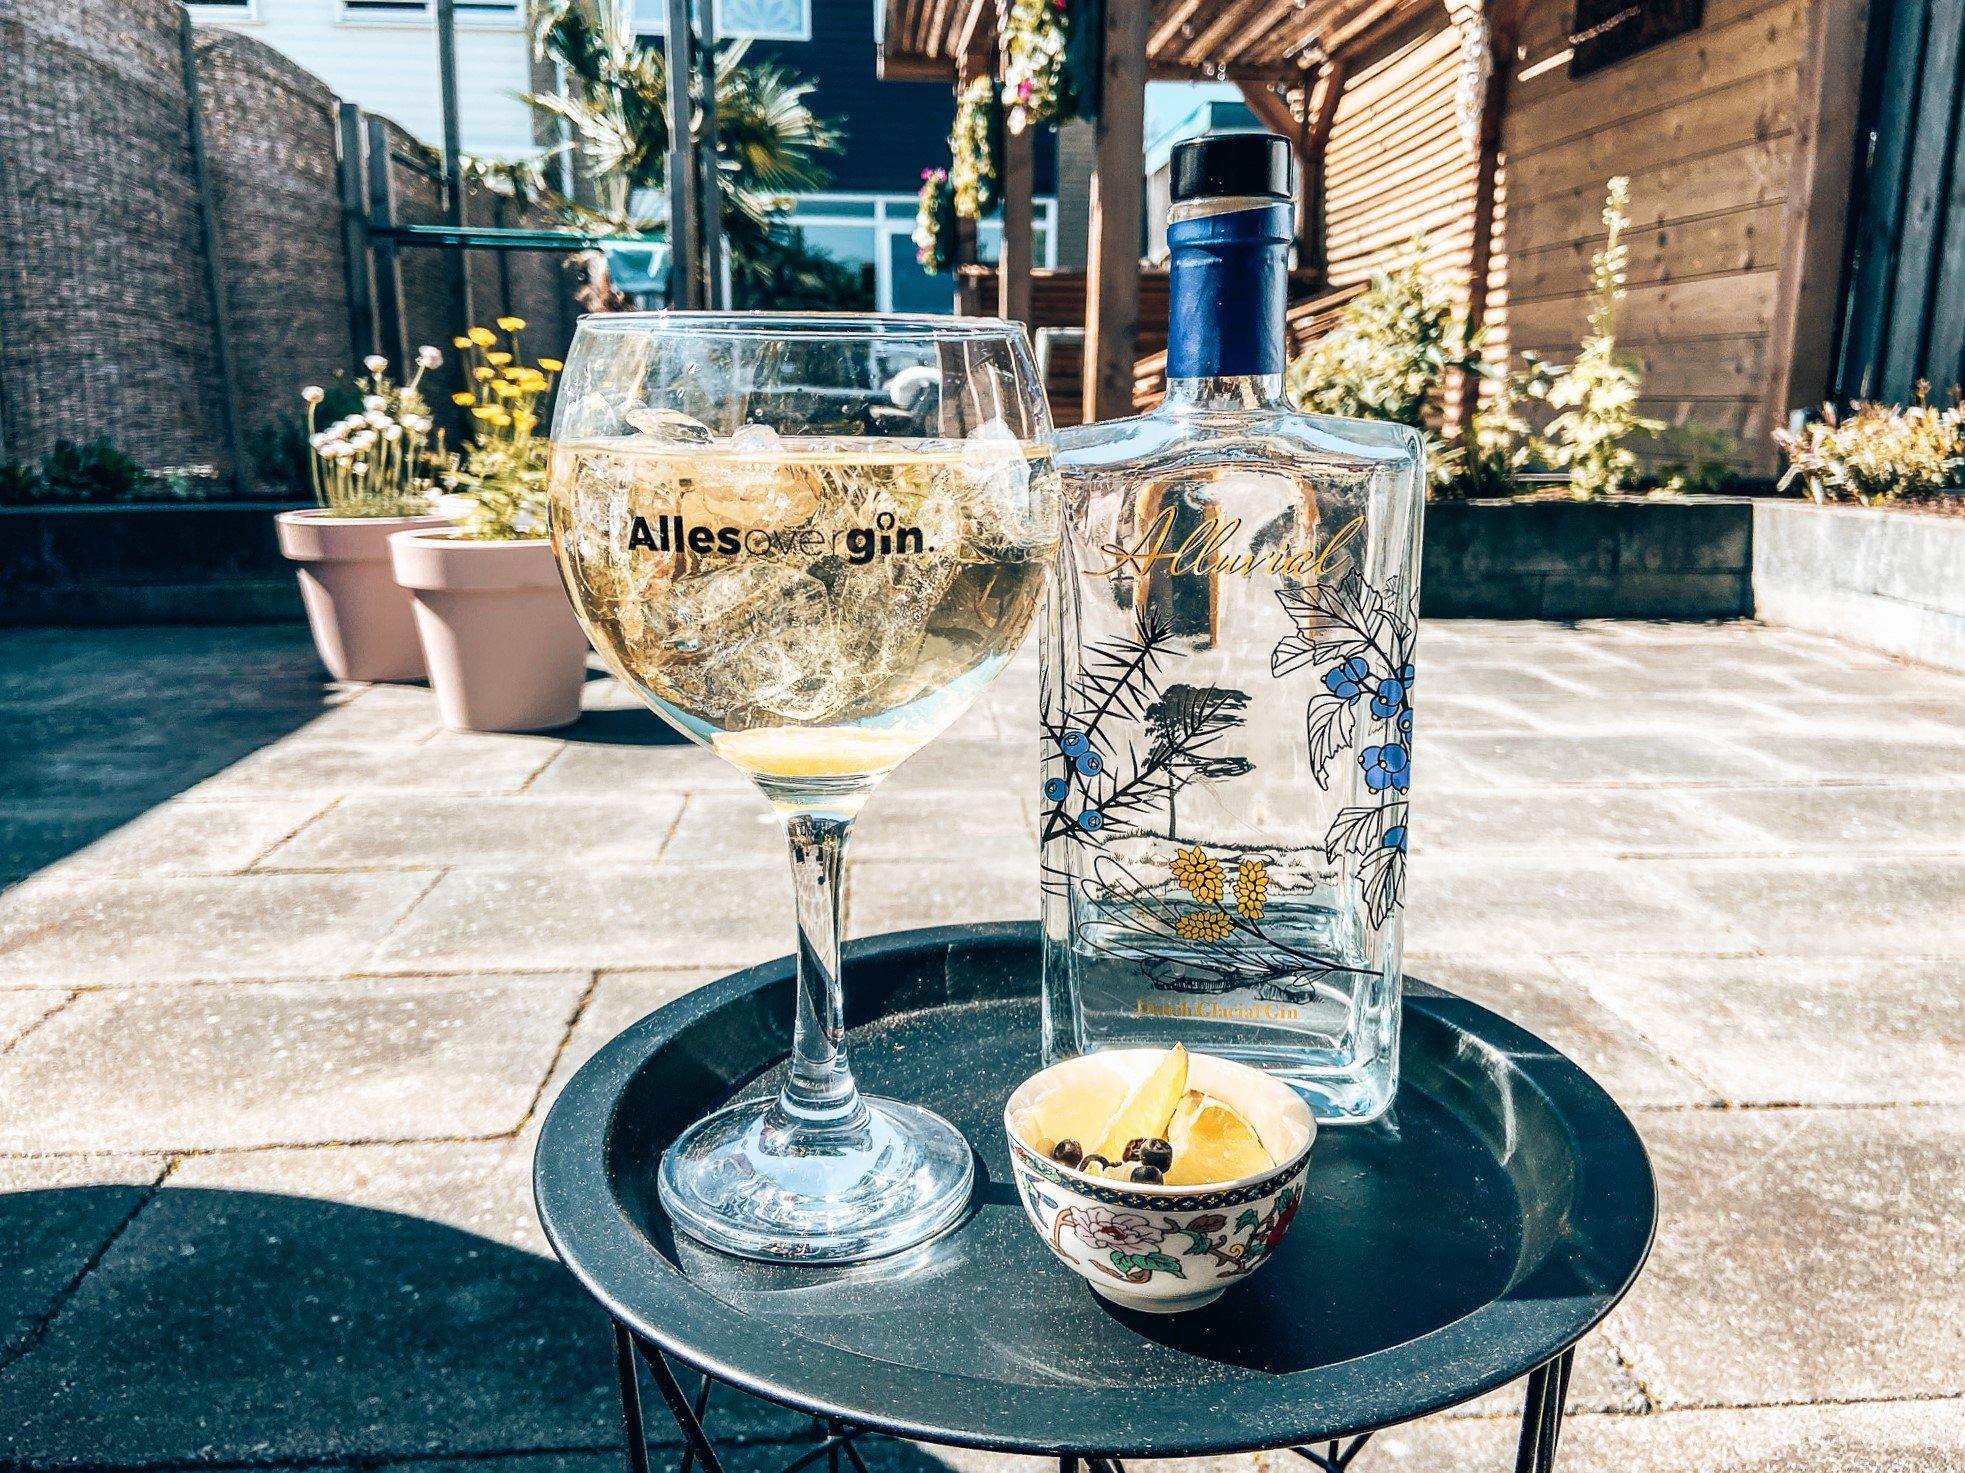 Perfect Alluvial serve, Alluvial Gin, Drumlin Distillery, Havelte, Alles over gin.